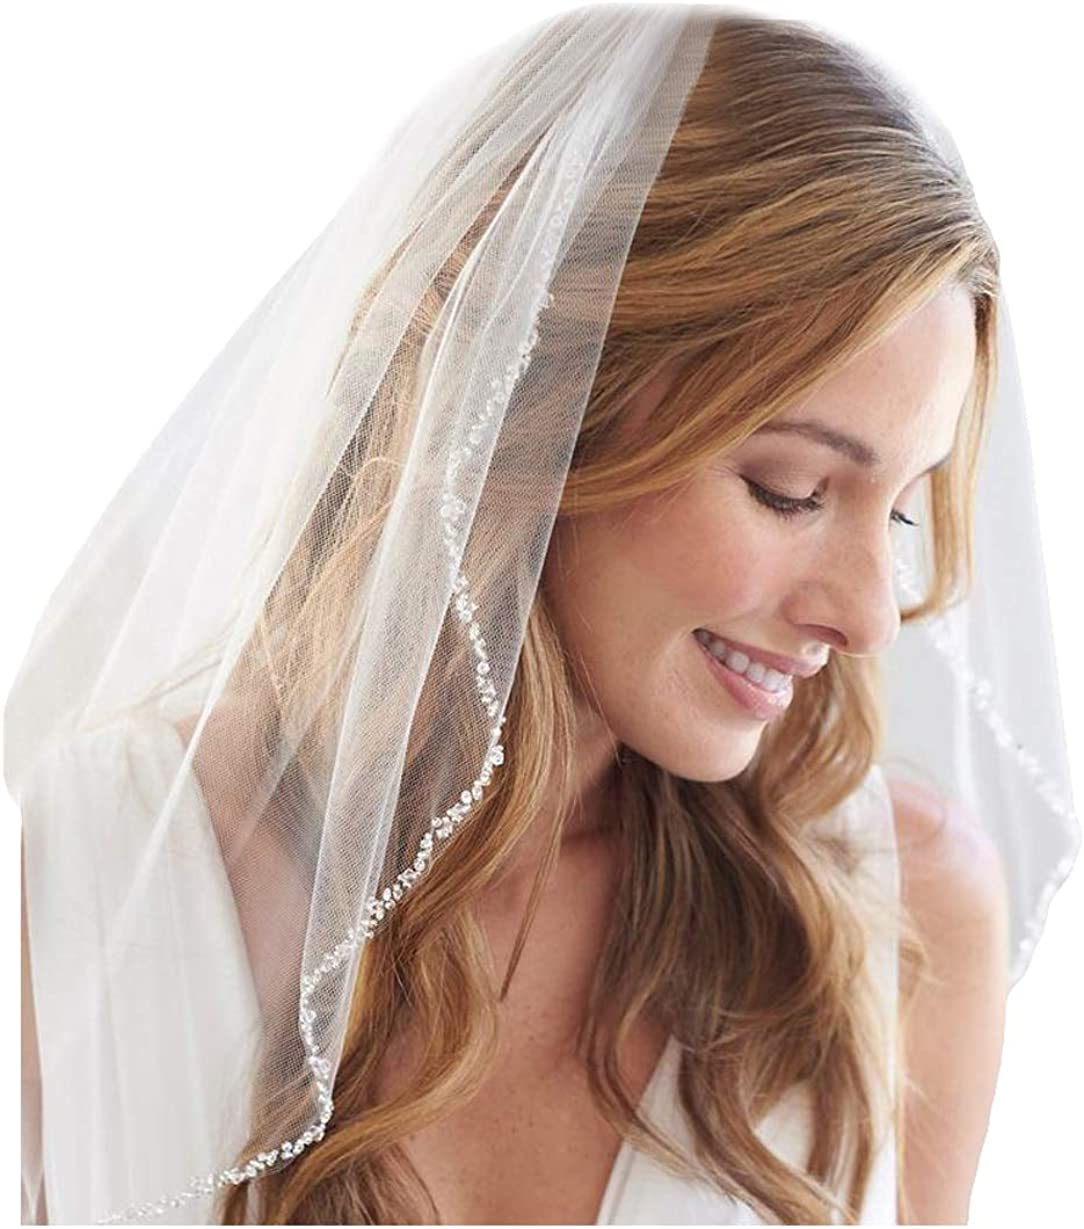 Fenghuavip Wedding Veil Fingertip Length Rhinestones Edge 1 Tier for Bride with Comb